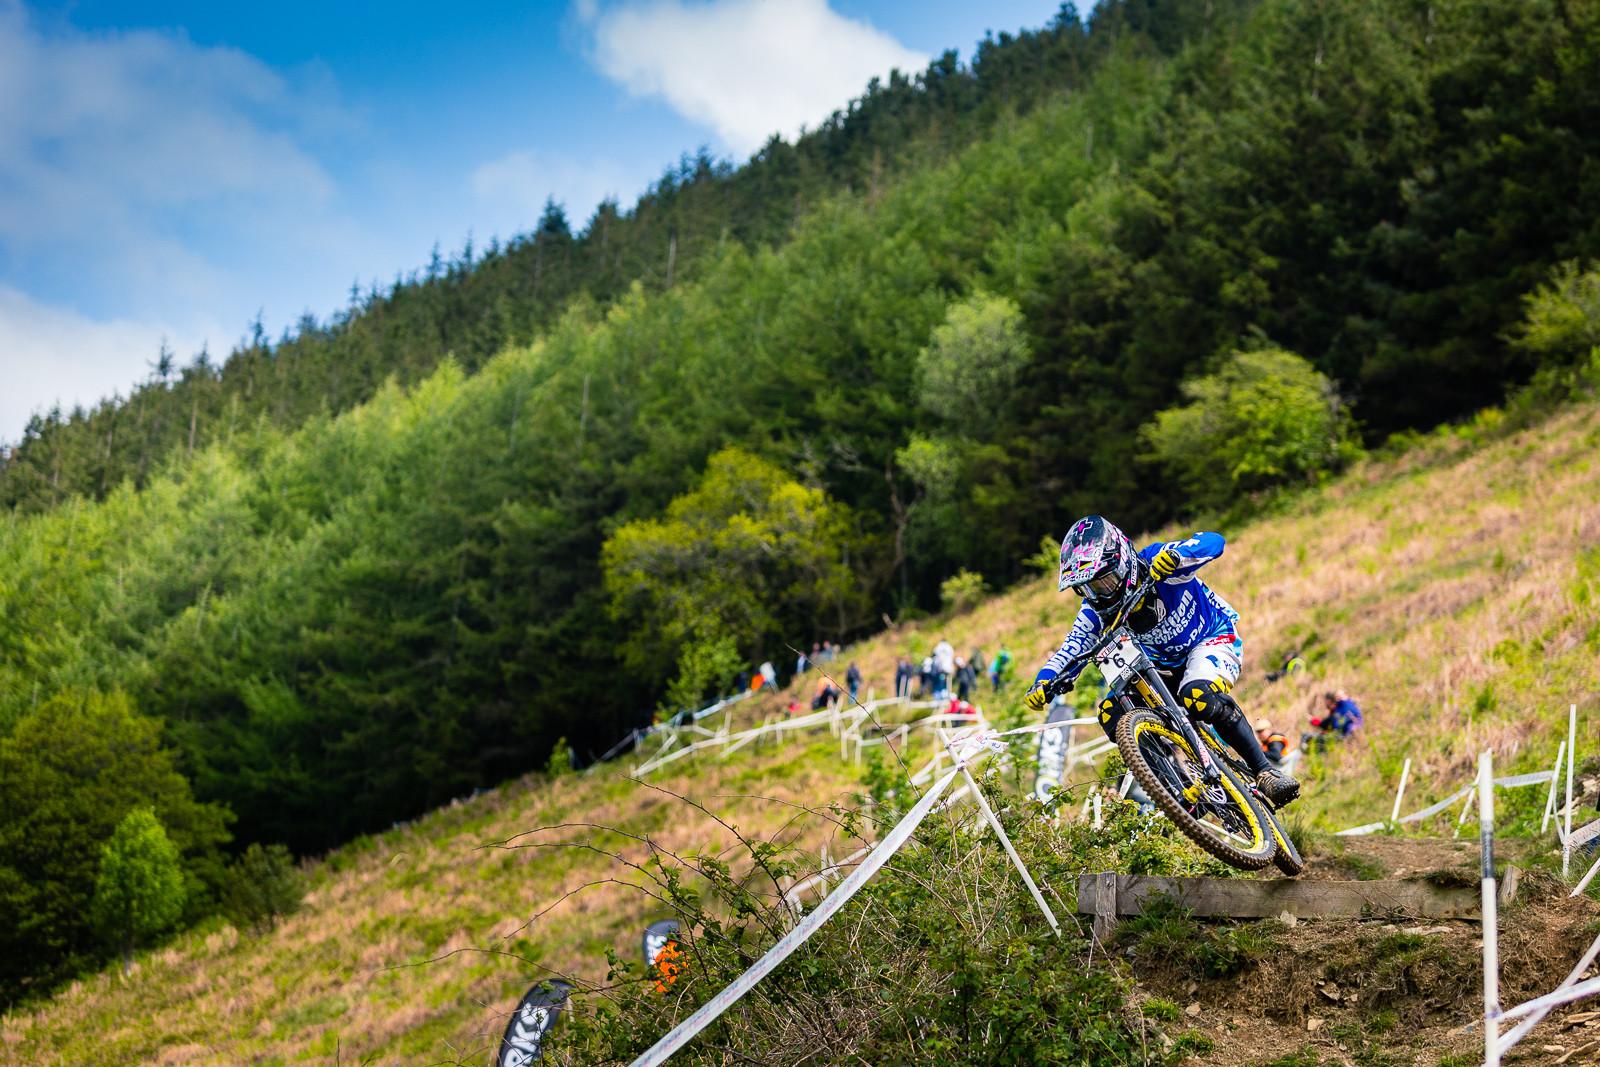 RACE REPORT - British Downhill Series, Llangollen - Joe Smith, 1st Place  - RACE REPORT - British Downhill Series Llangollen - Mountain Biking Pictures - Vital MTB